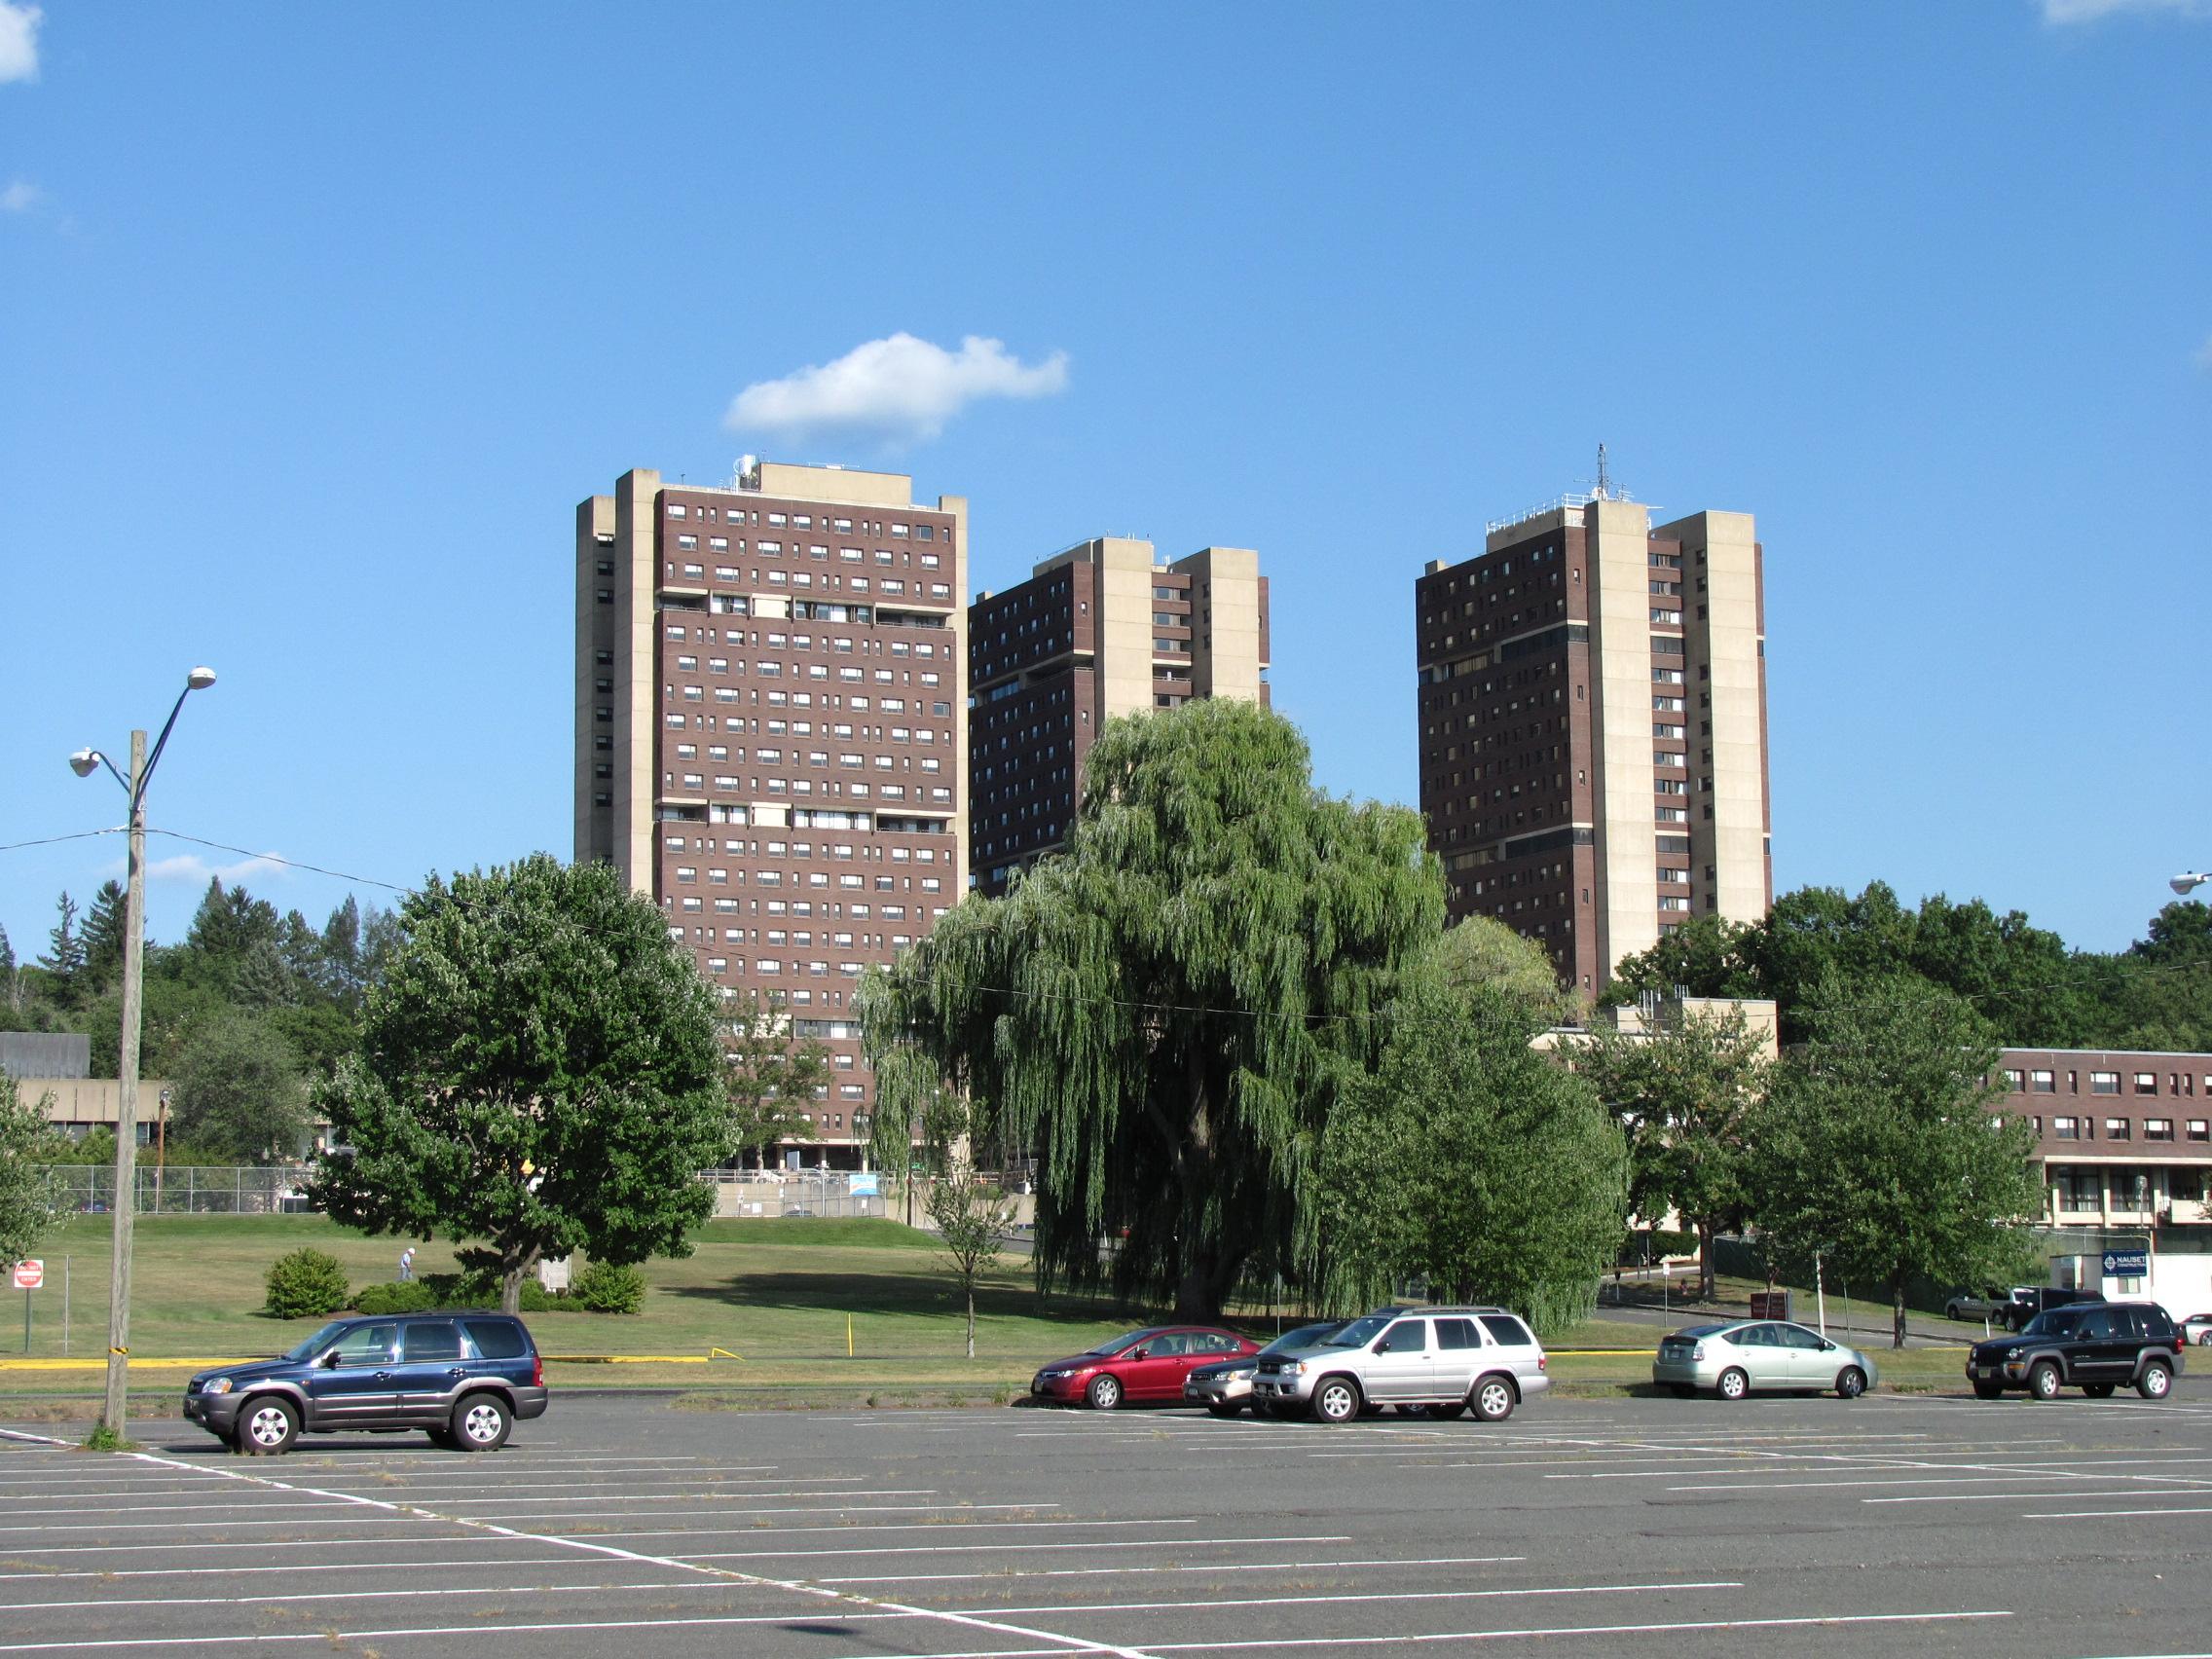 Photo courtesy of Wikimedia Commons.   The John Quincy Adams Residence Hall at UMass.